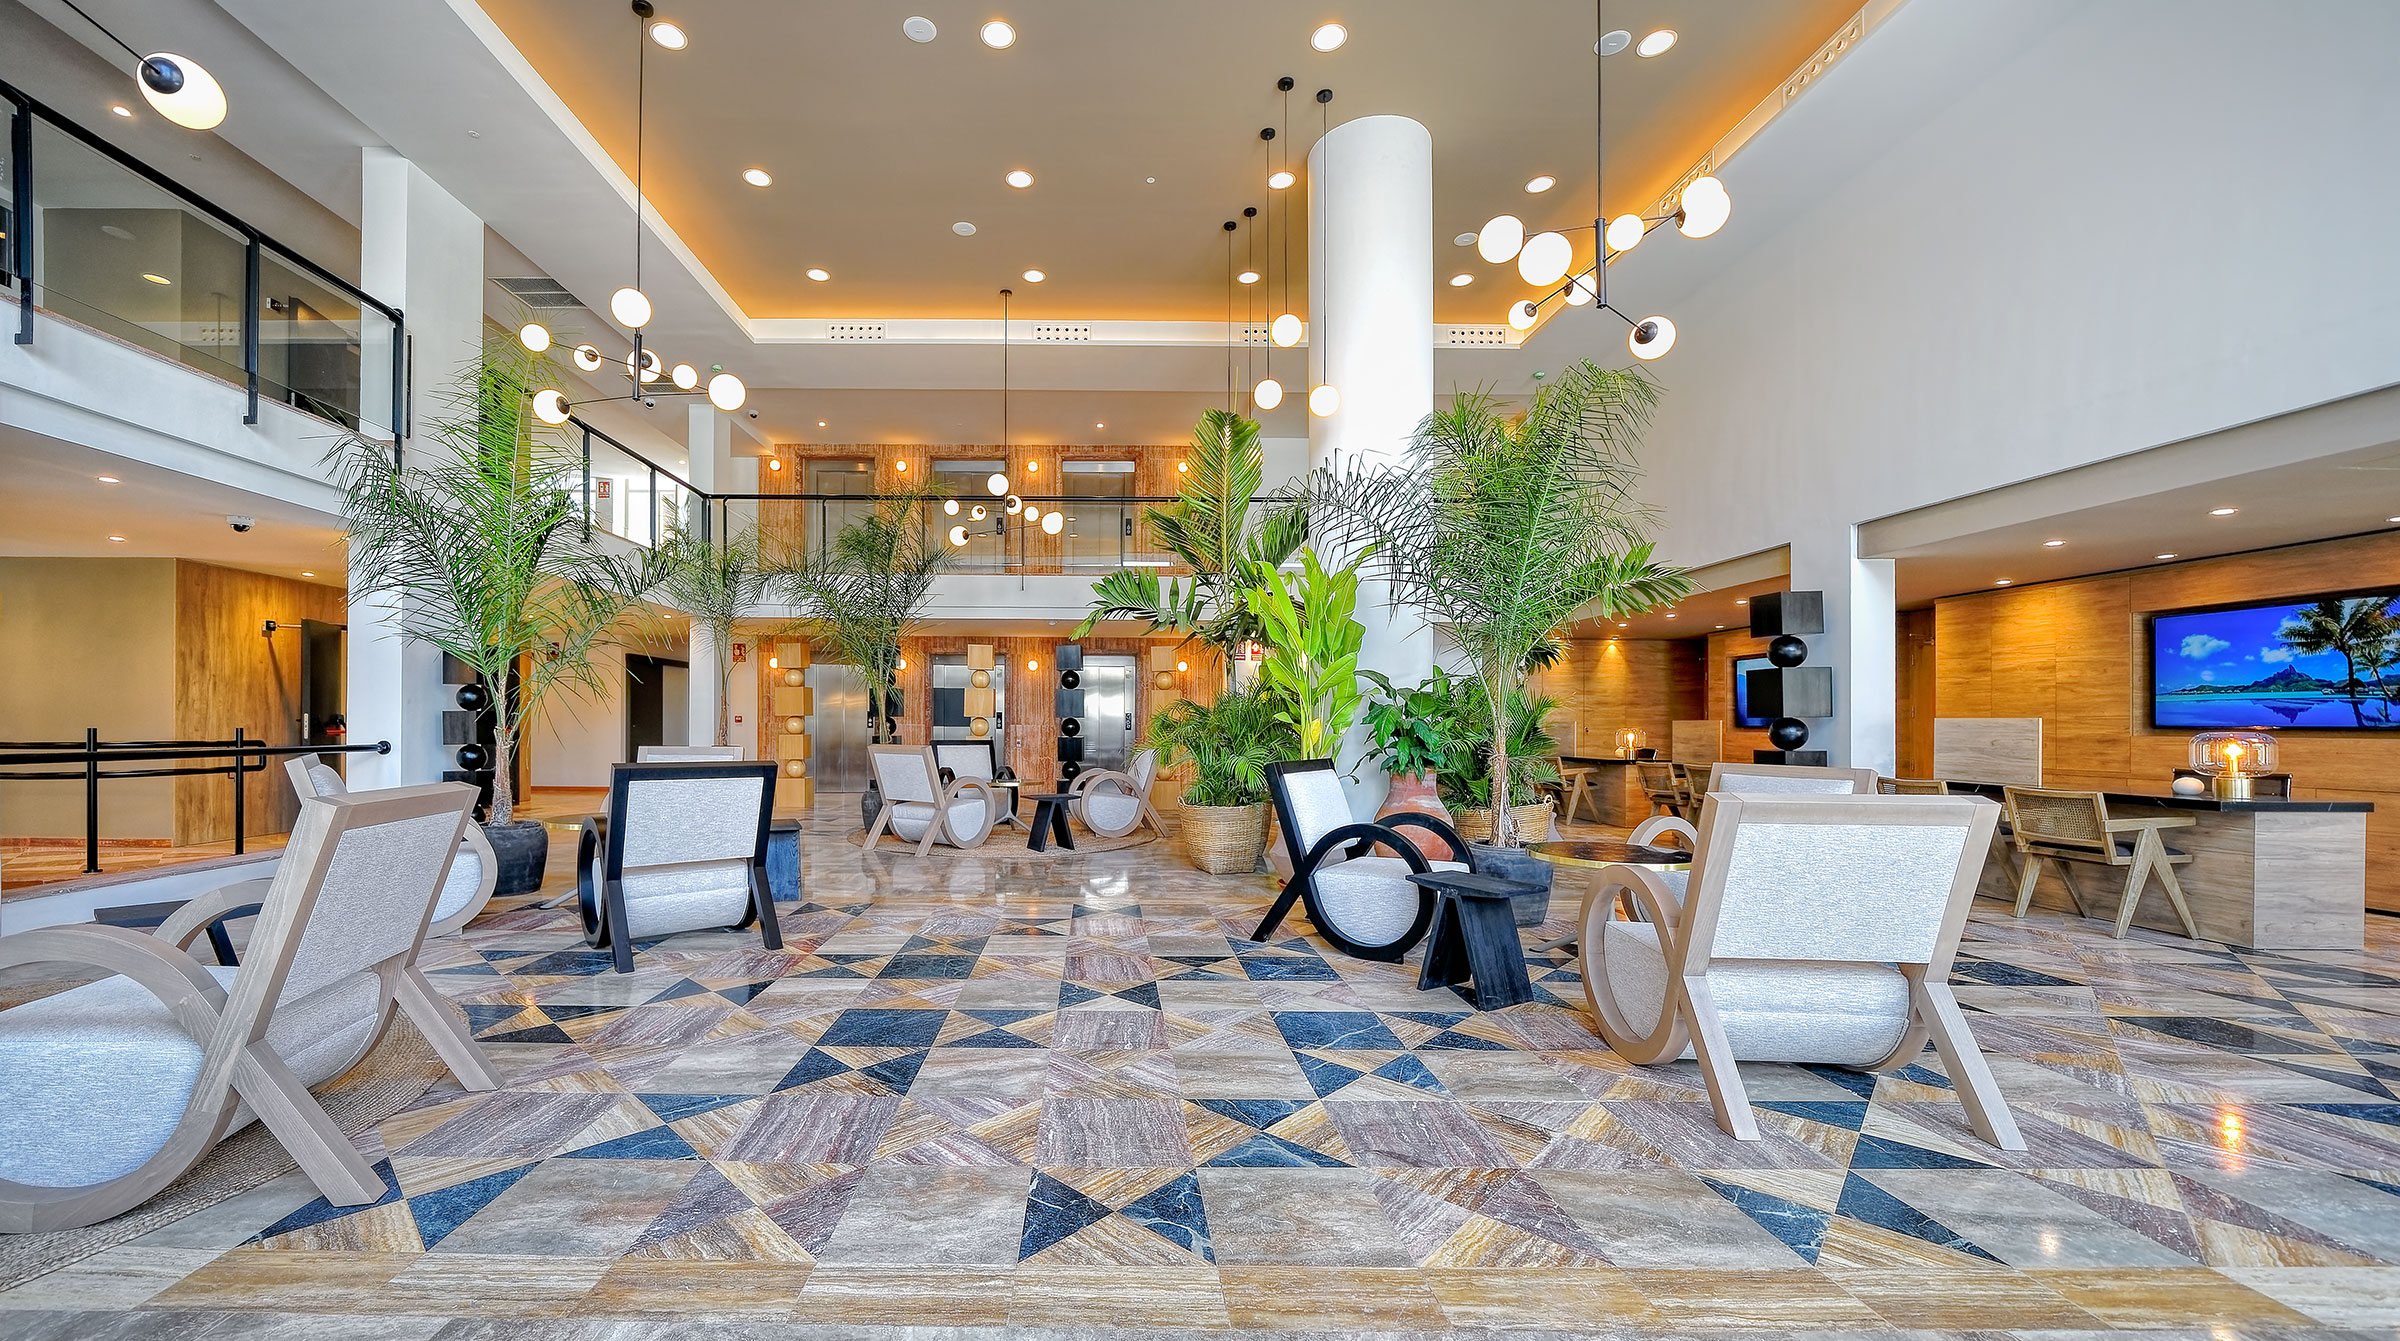 labranda-costa-mogan-hotel-gran-canaria 3635